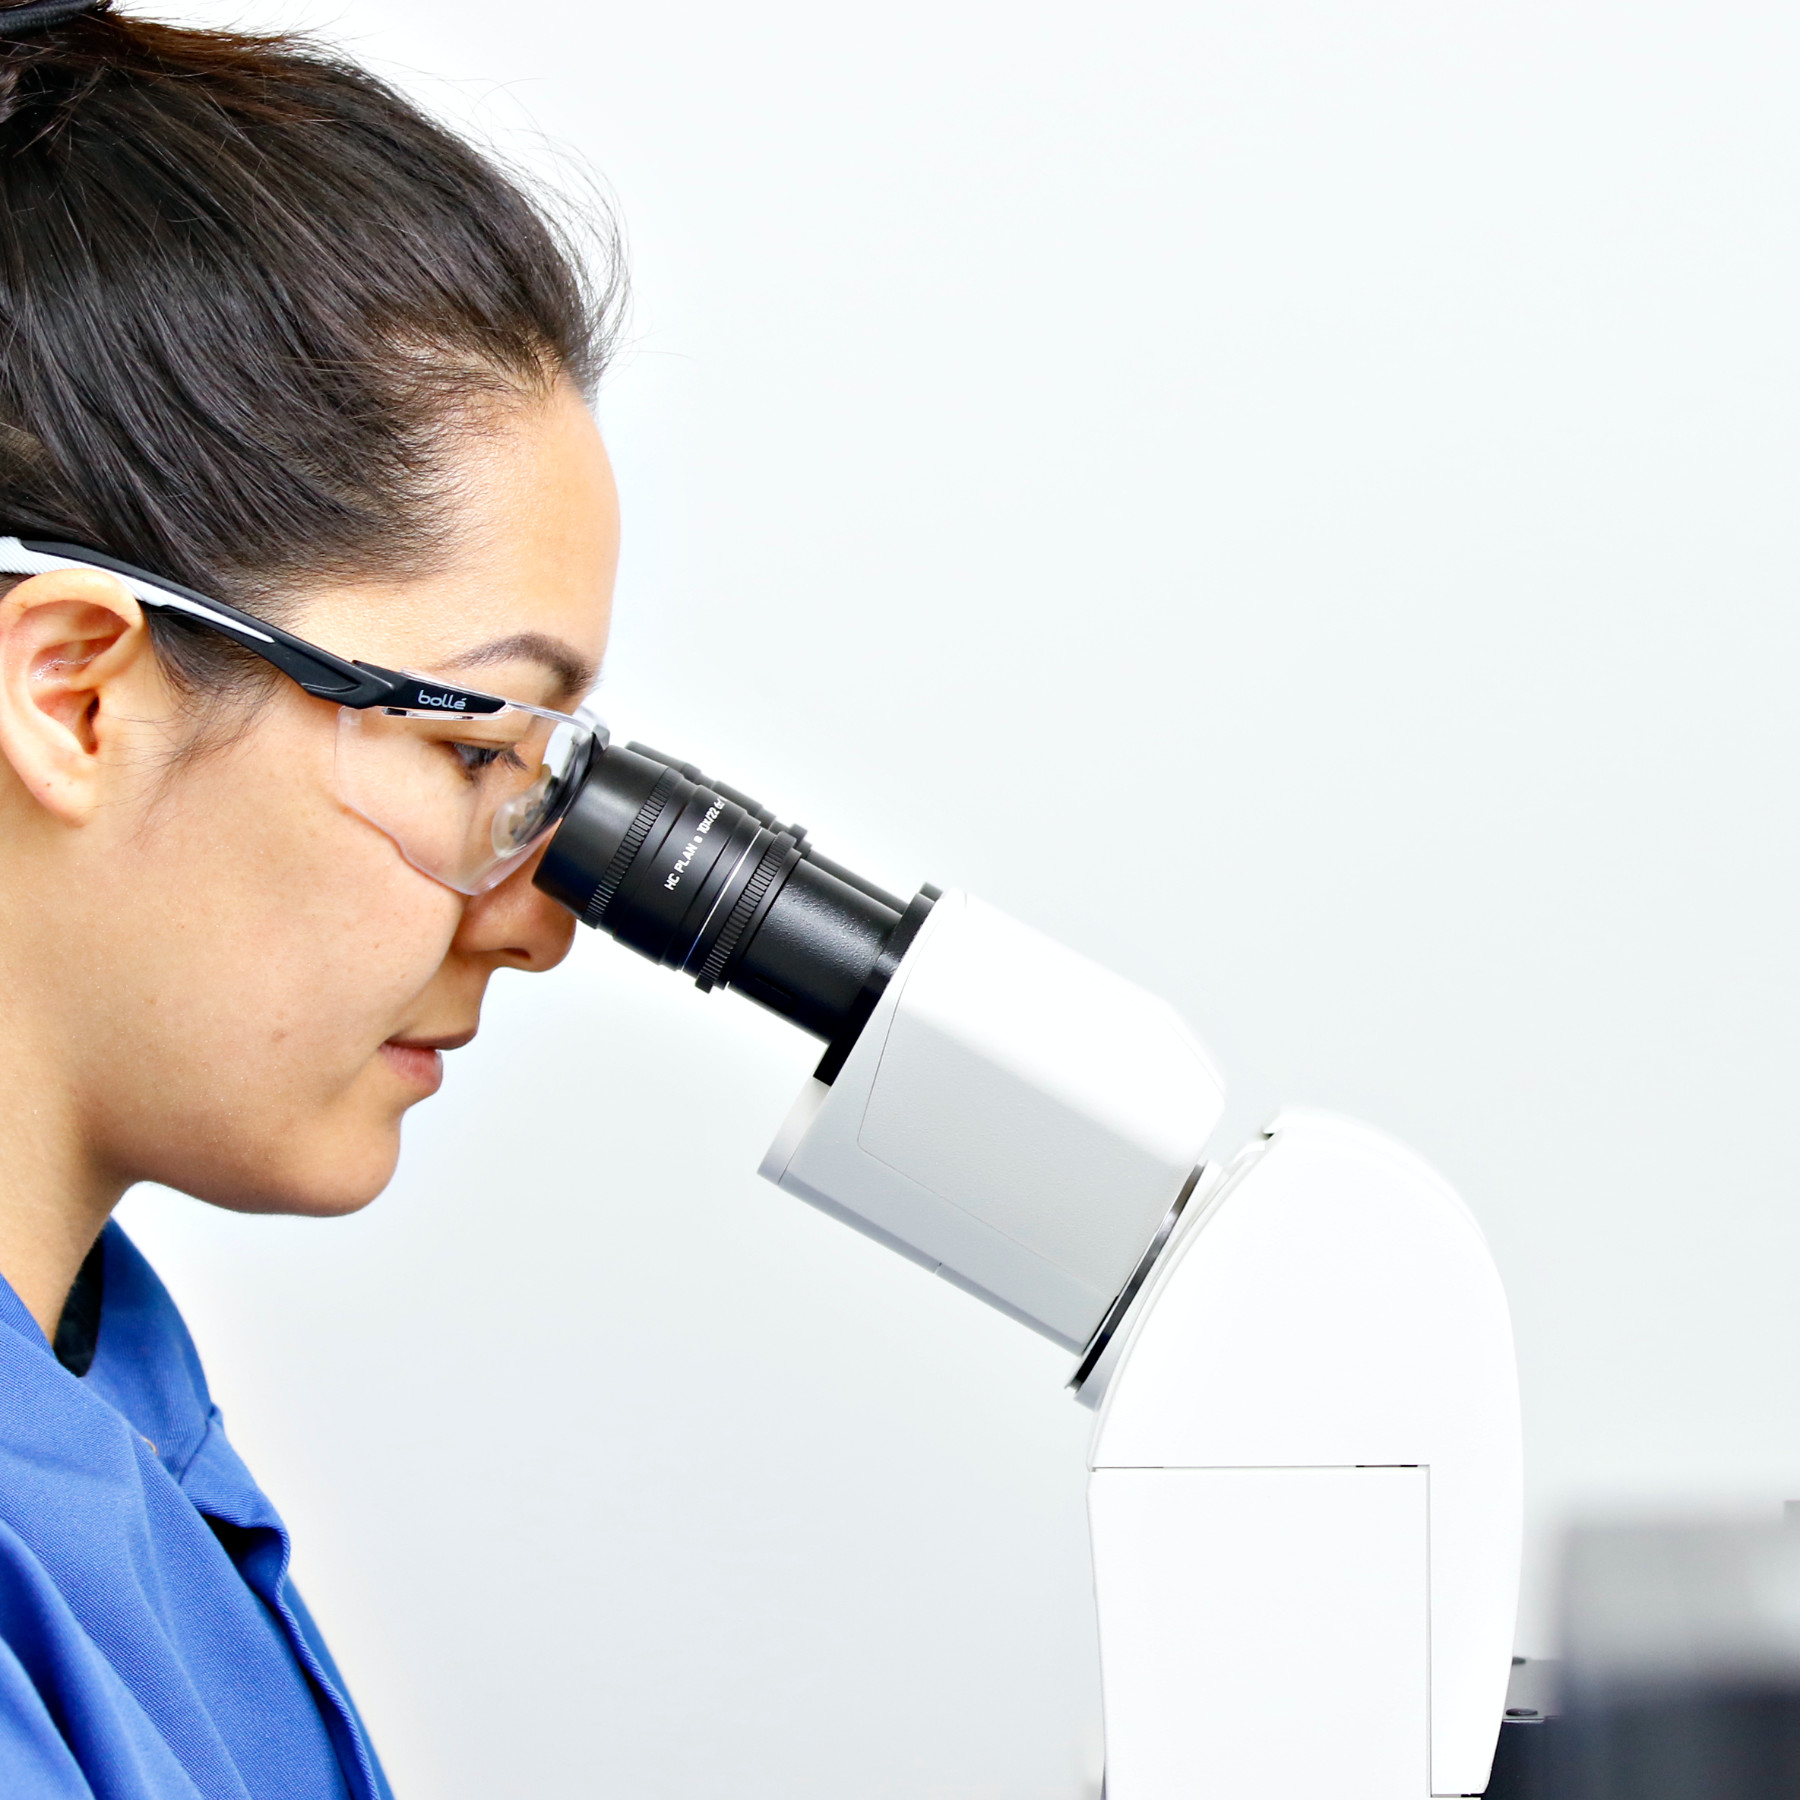 Stem cell services